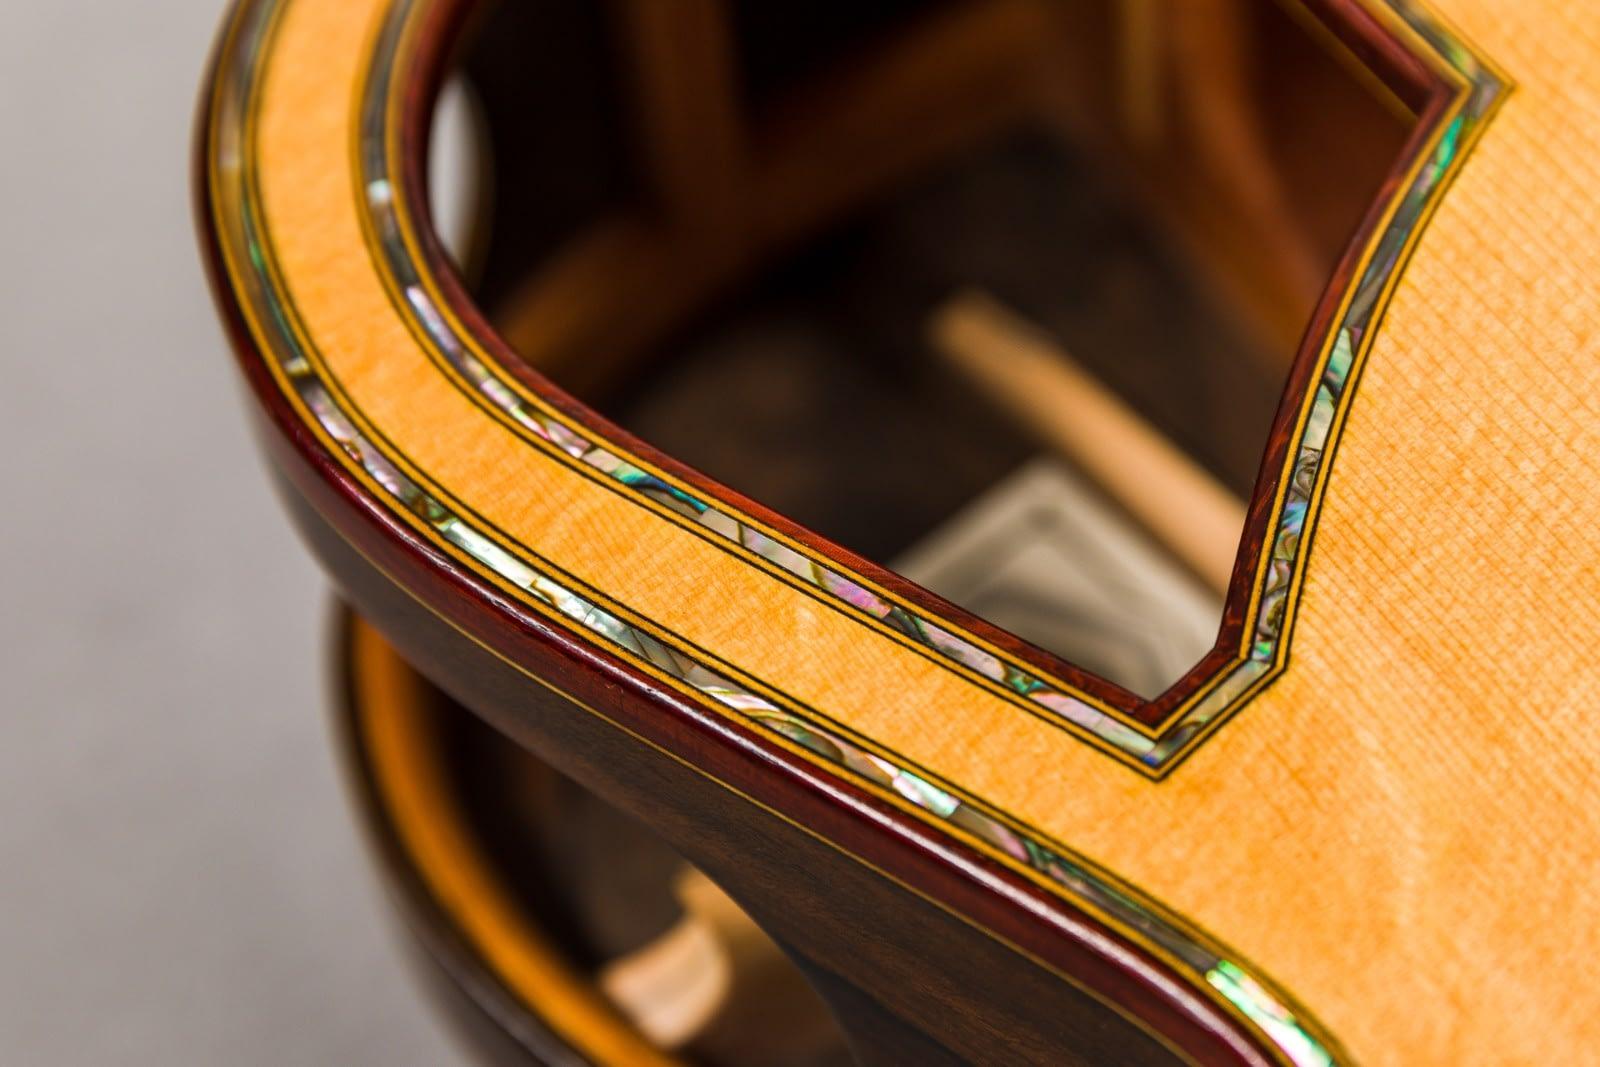 insight handmade steelstring guitar abalone sounhole purfling padauk binding